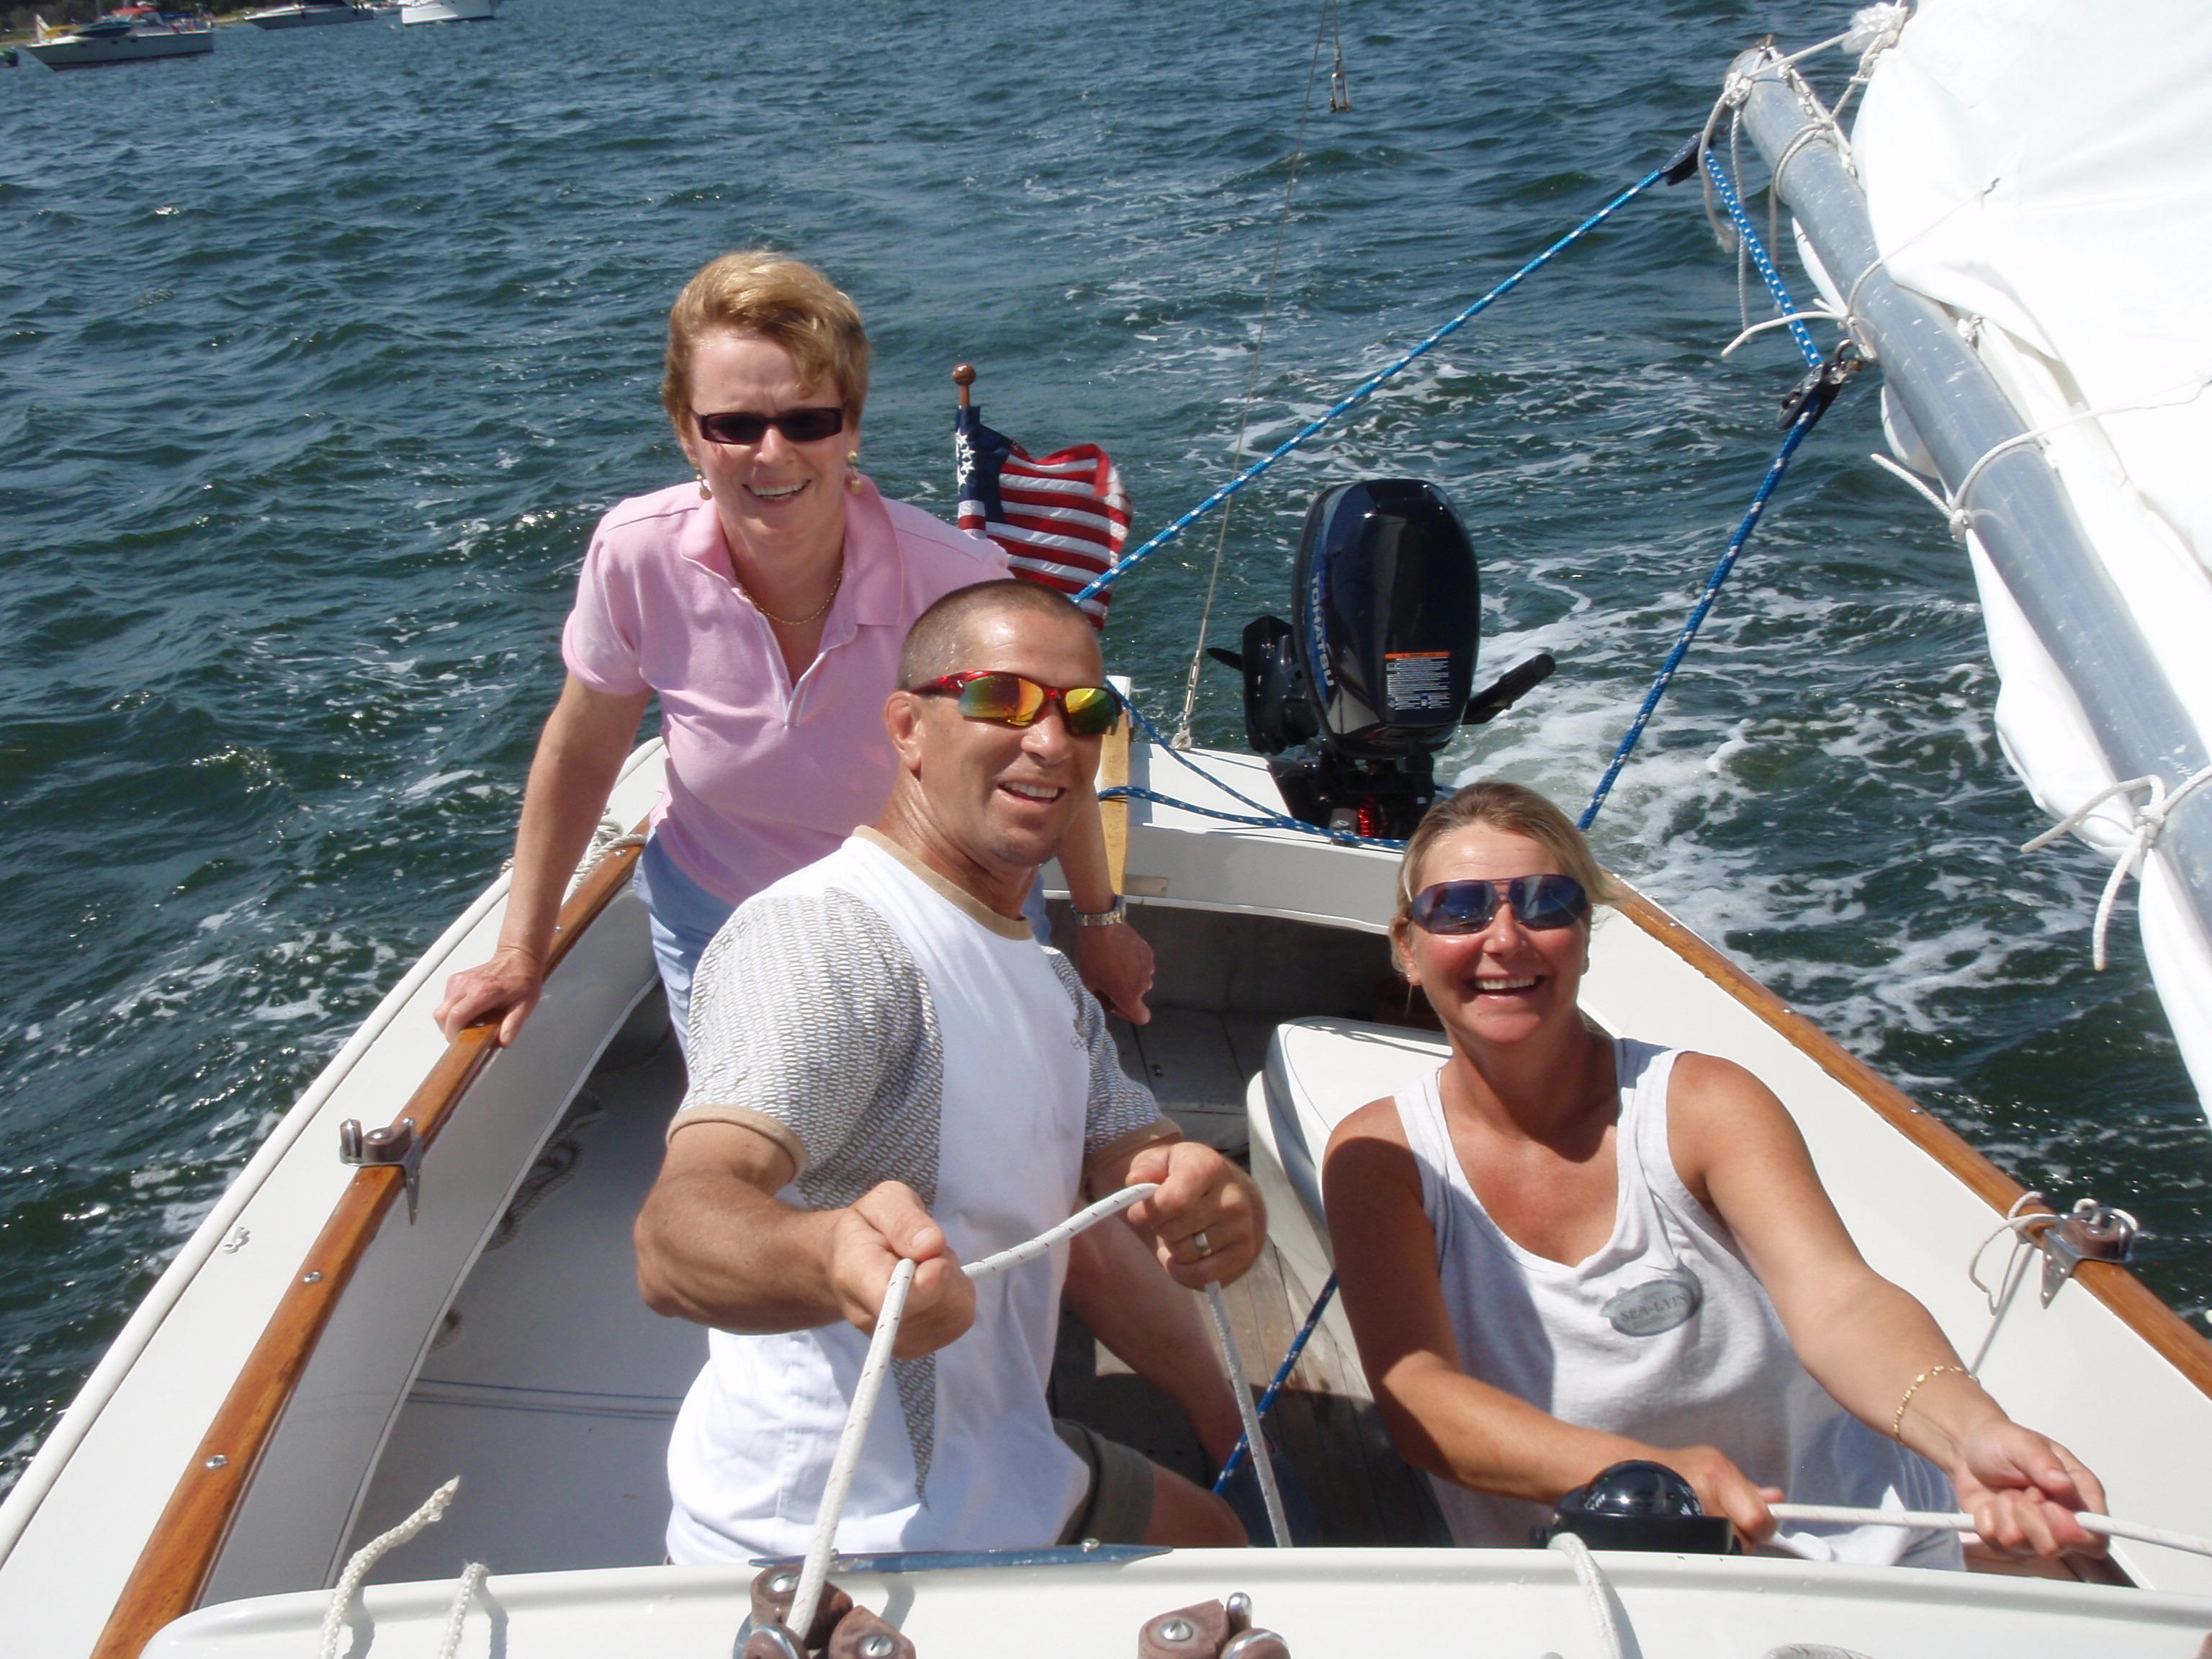 Cape Cod Sailing School